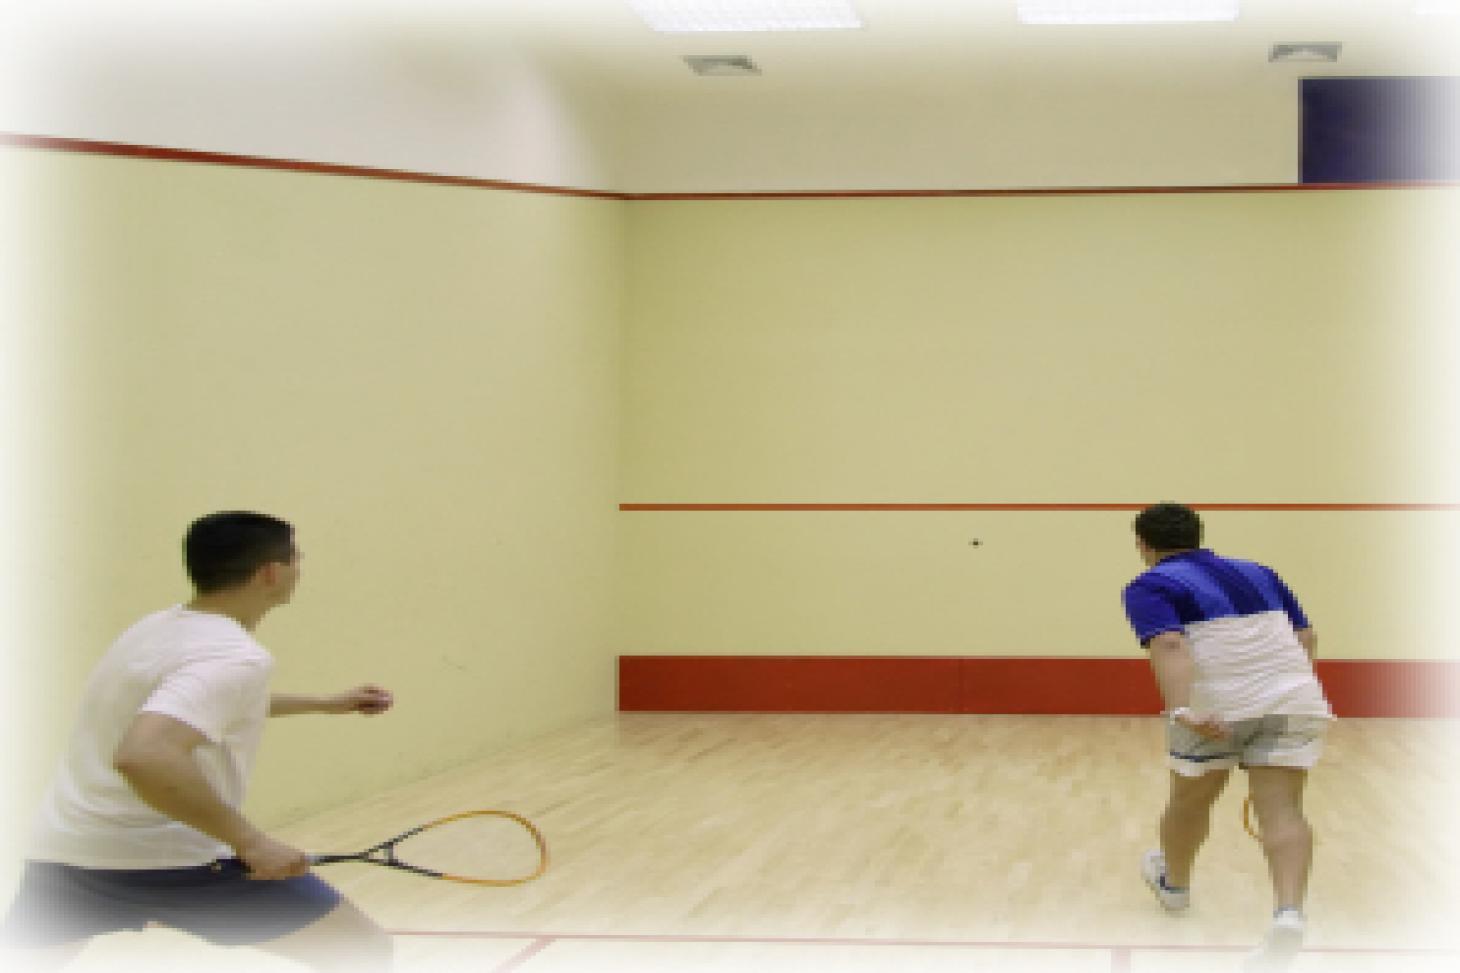 Croydon Gas Sports Club Indoor | Hard squash court